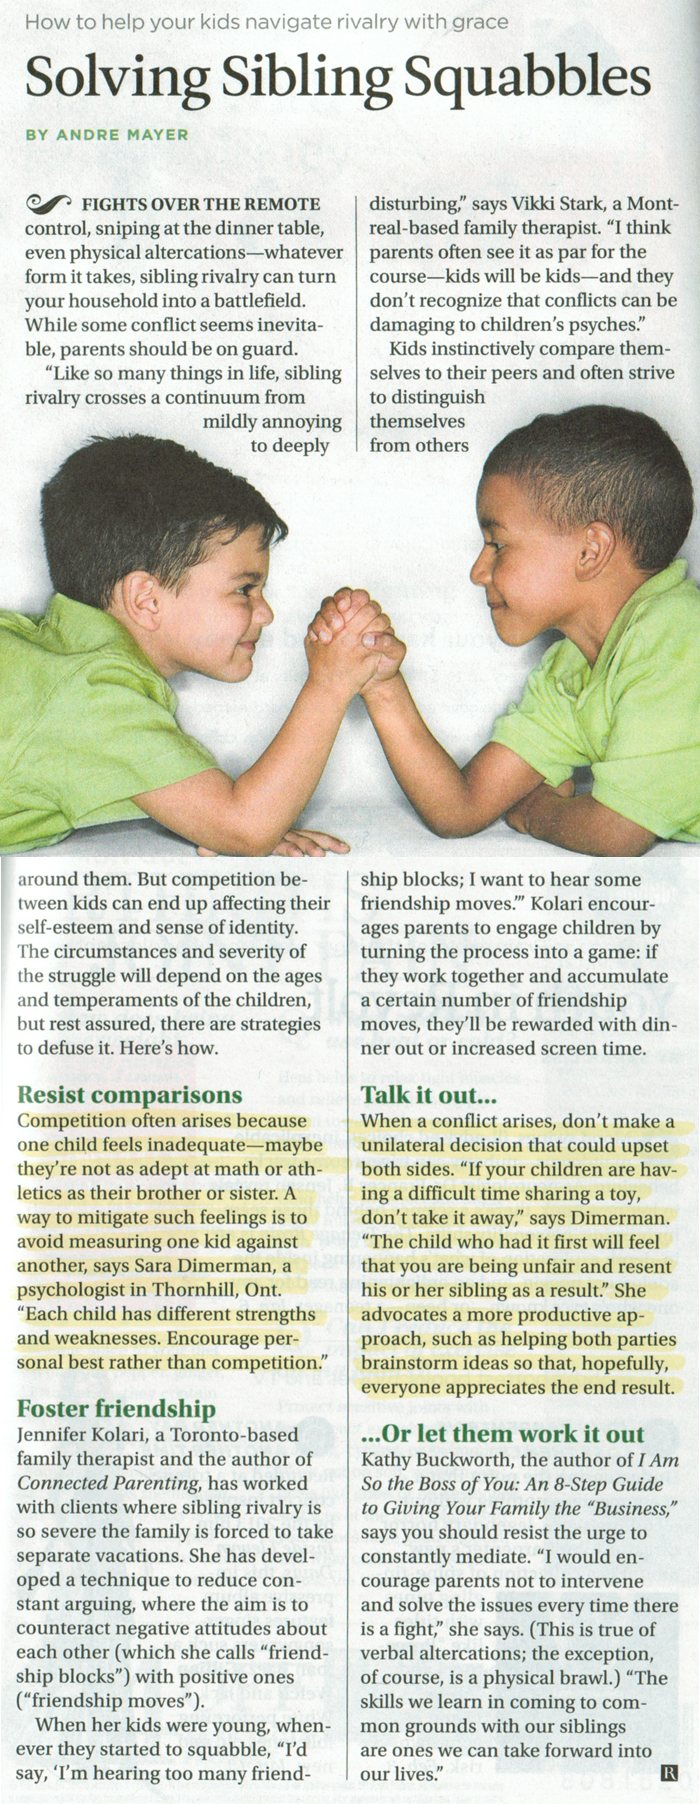 Image: Solving Sibling Squabbles